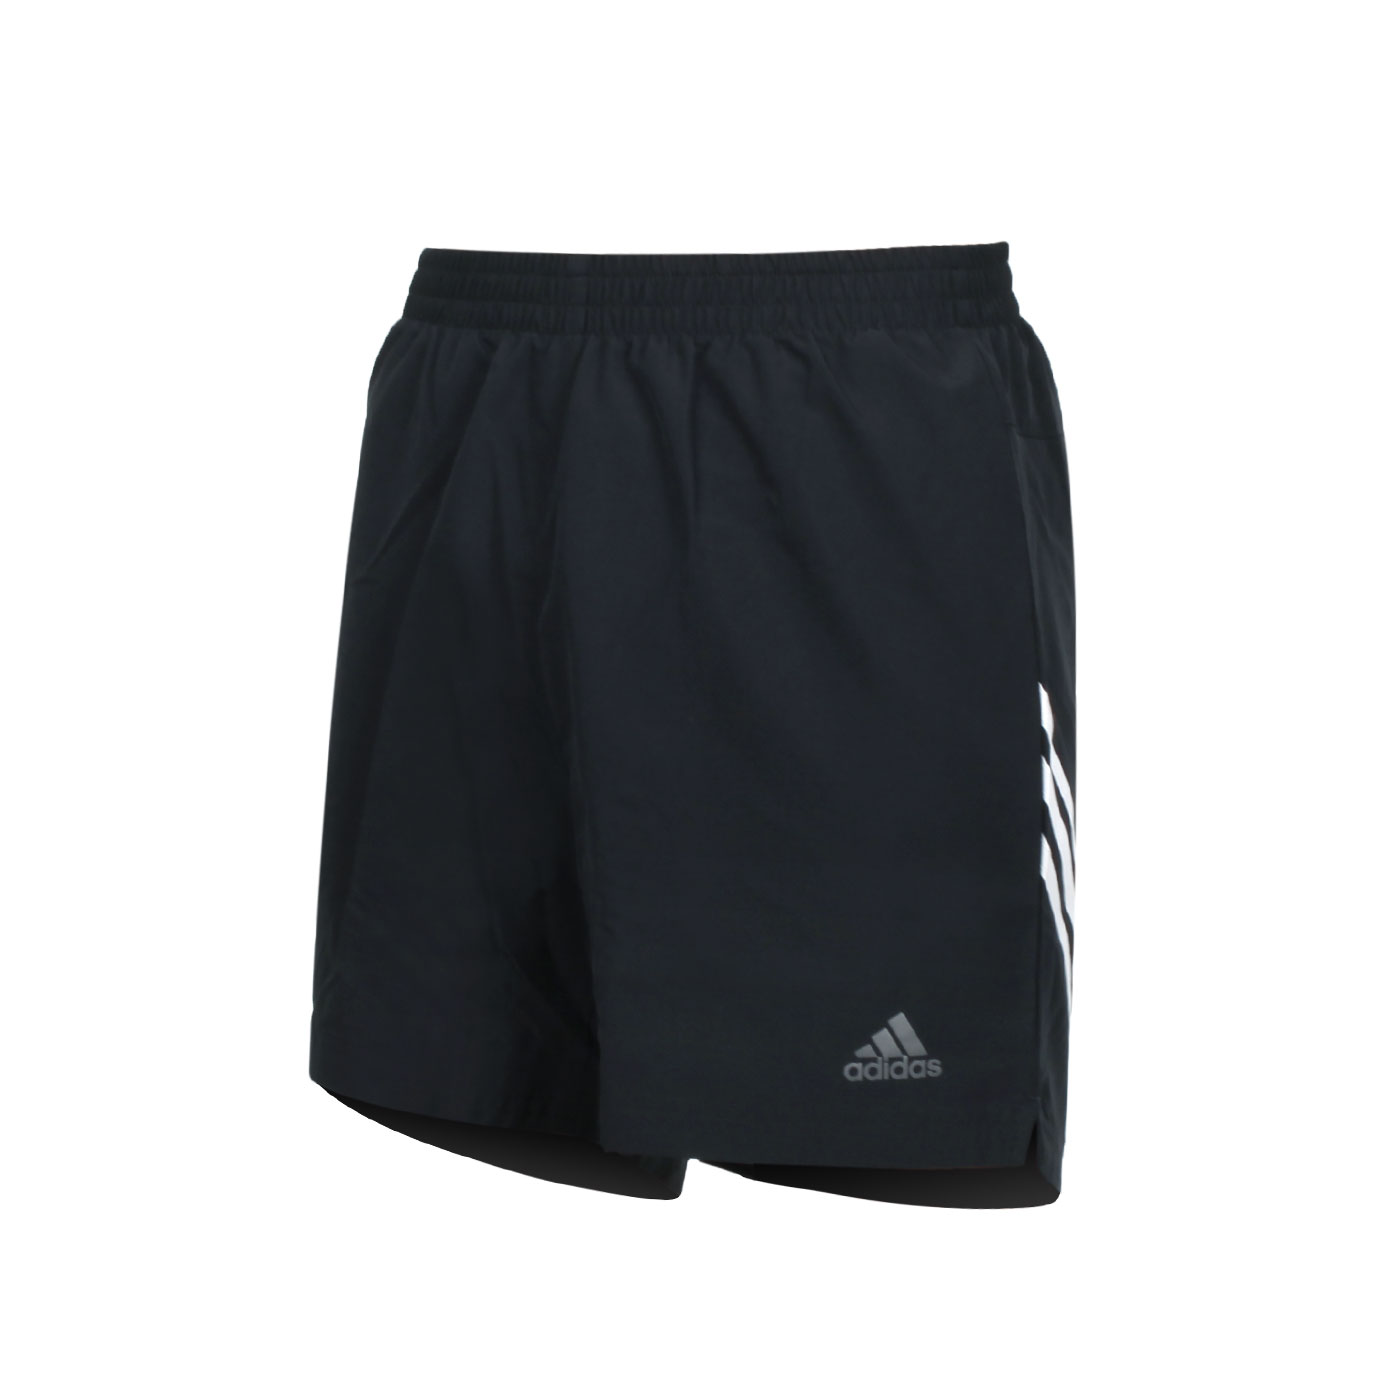 ADIDAS 男款運動短褲 FK1939 - 黑白